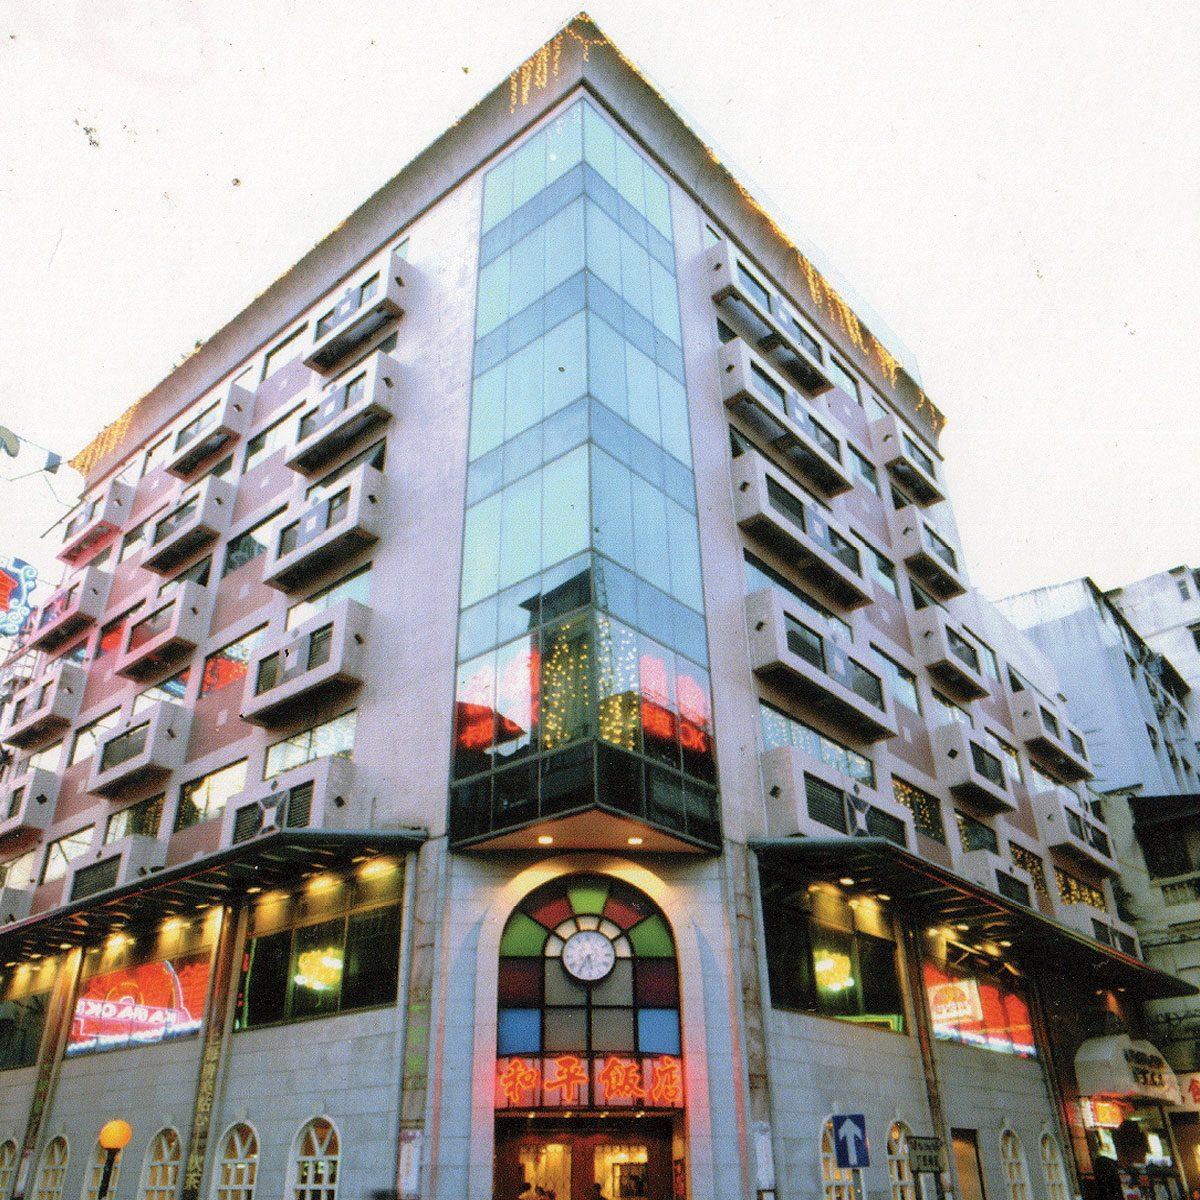 Bel Shine Centre at 40-42 Nga Tsin Wai Road, Kowloon City, Kowloon